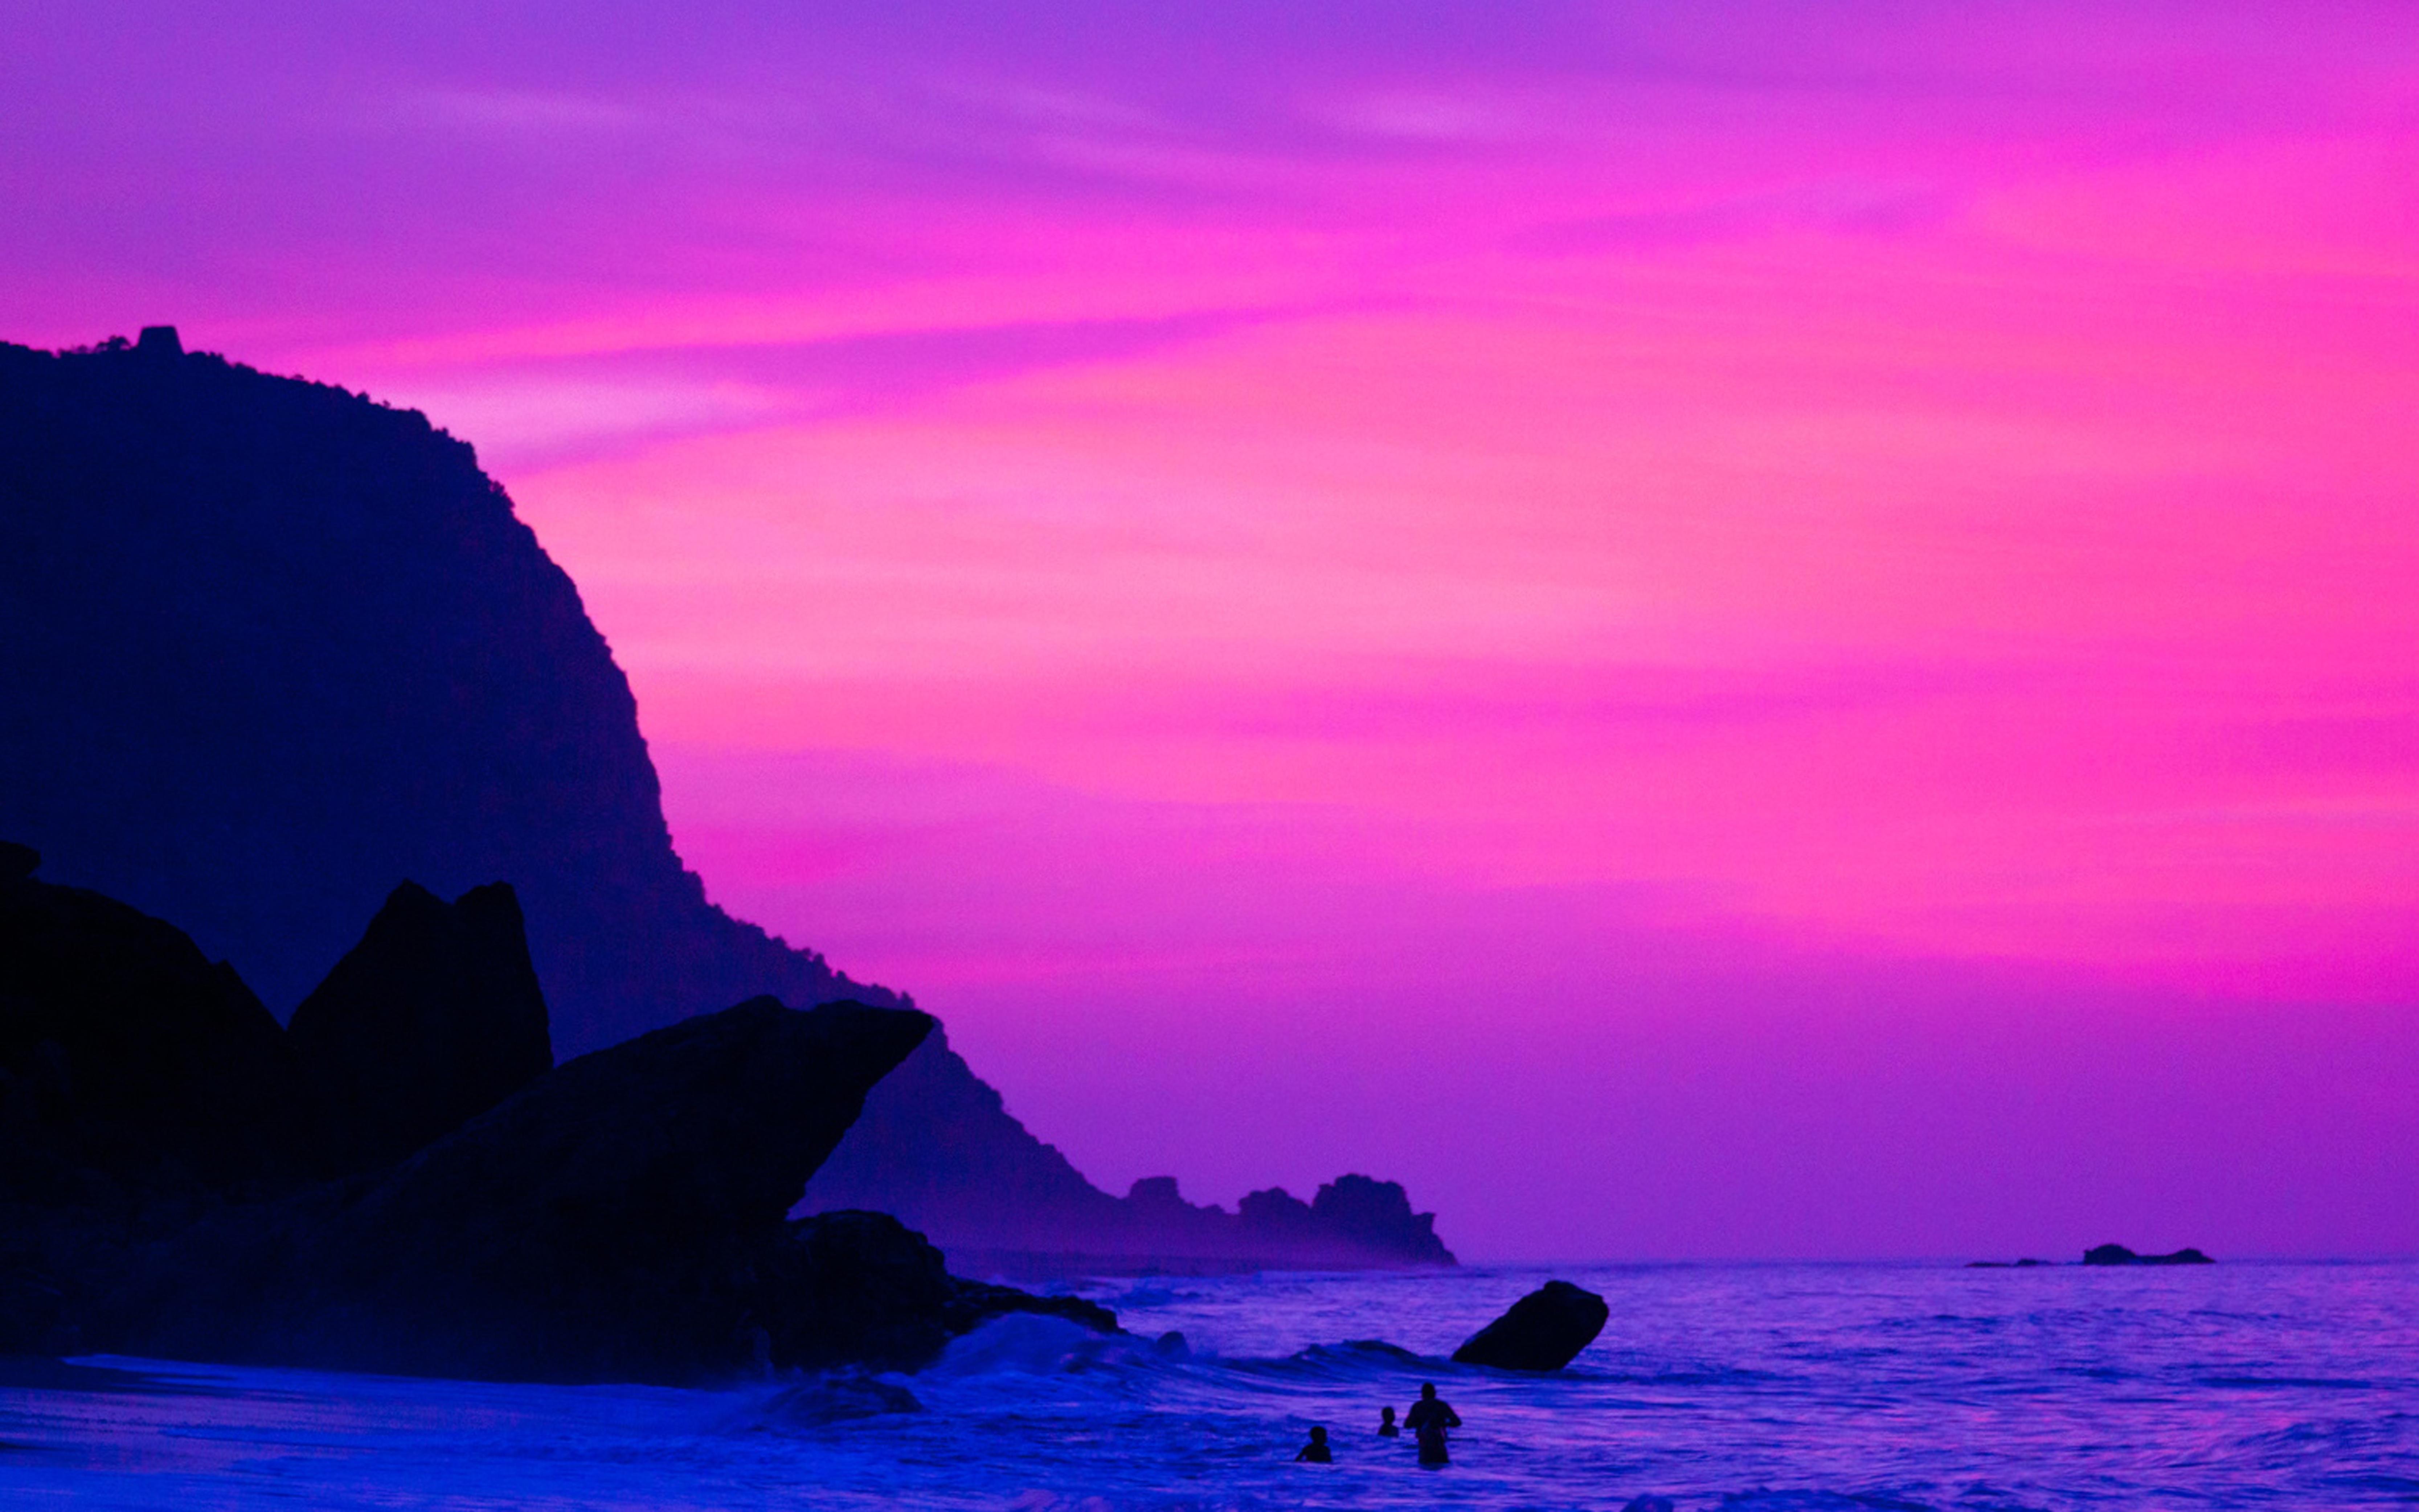 File:Amazing colorful sunset.jpg - Wikimedia Commons